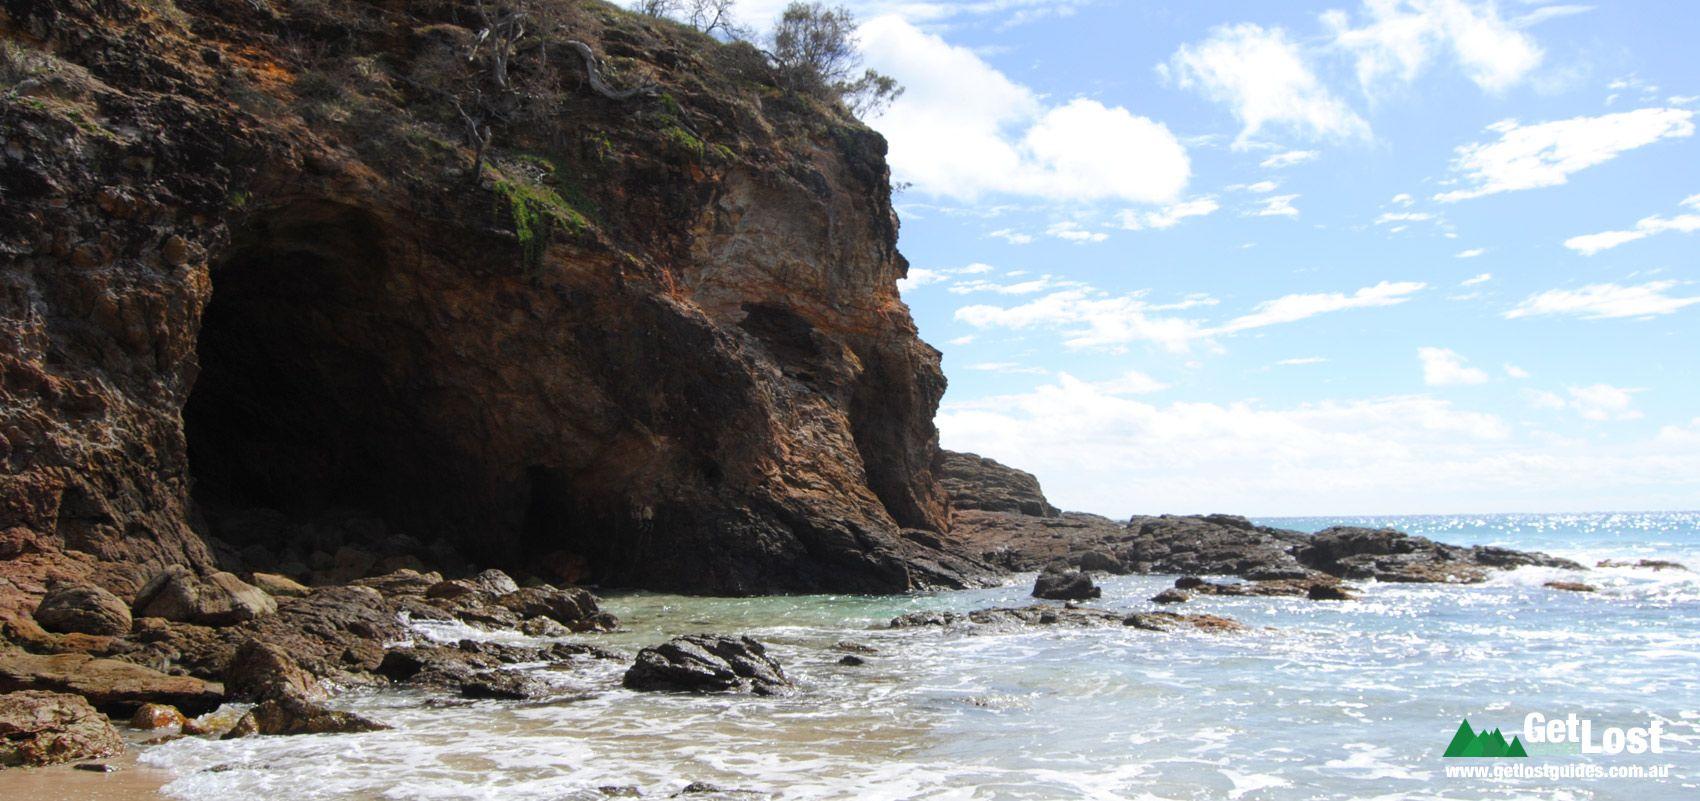 Moreton island cave sand island beautiful islands resort